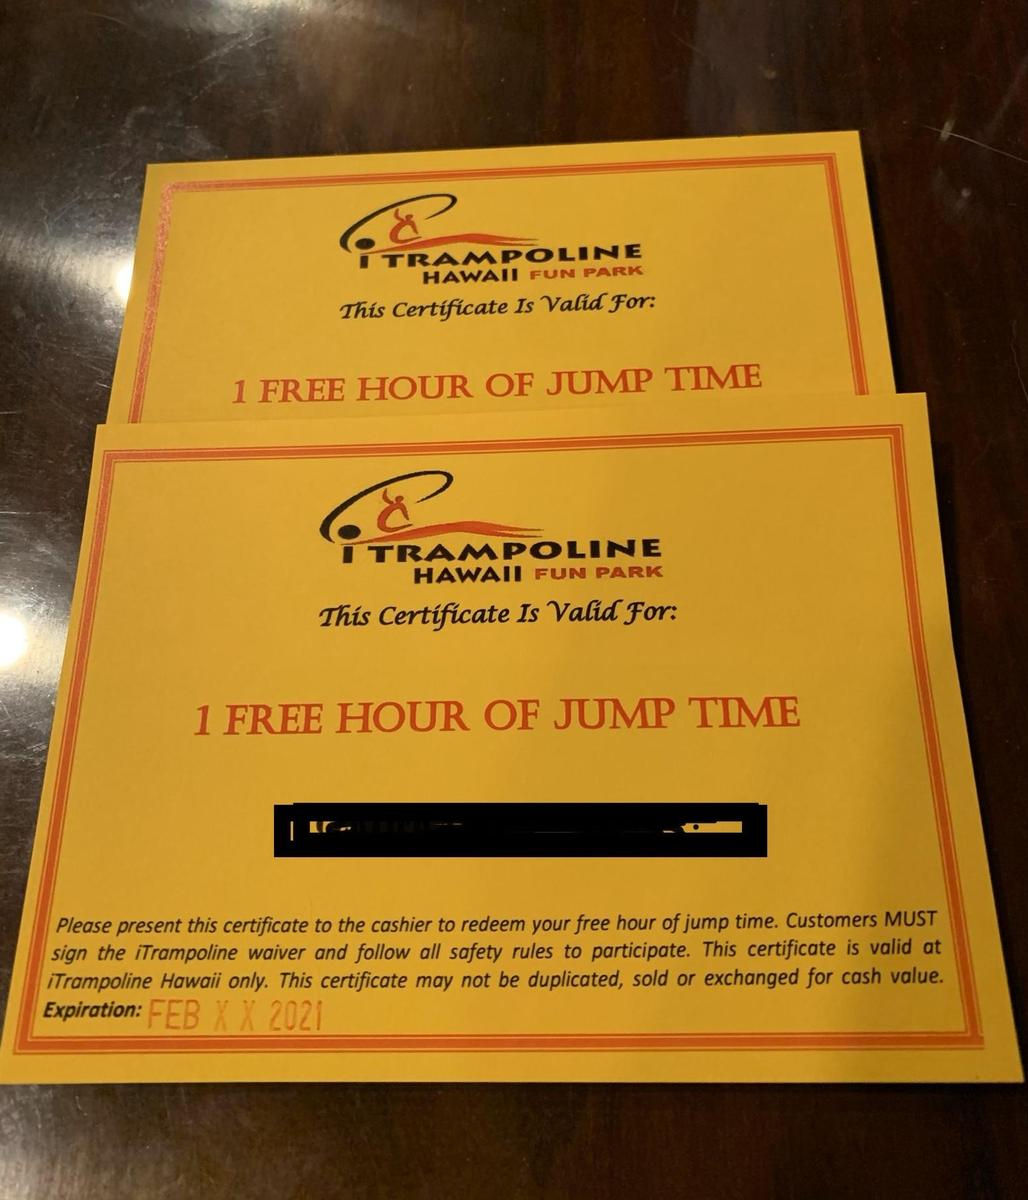 iTrampoline certificates